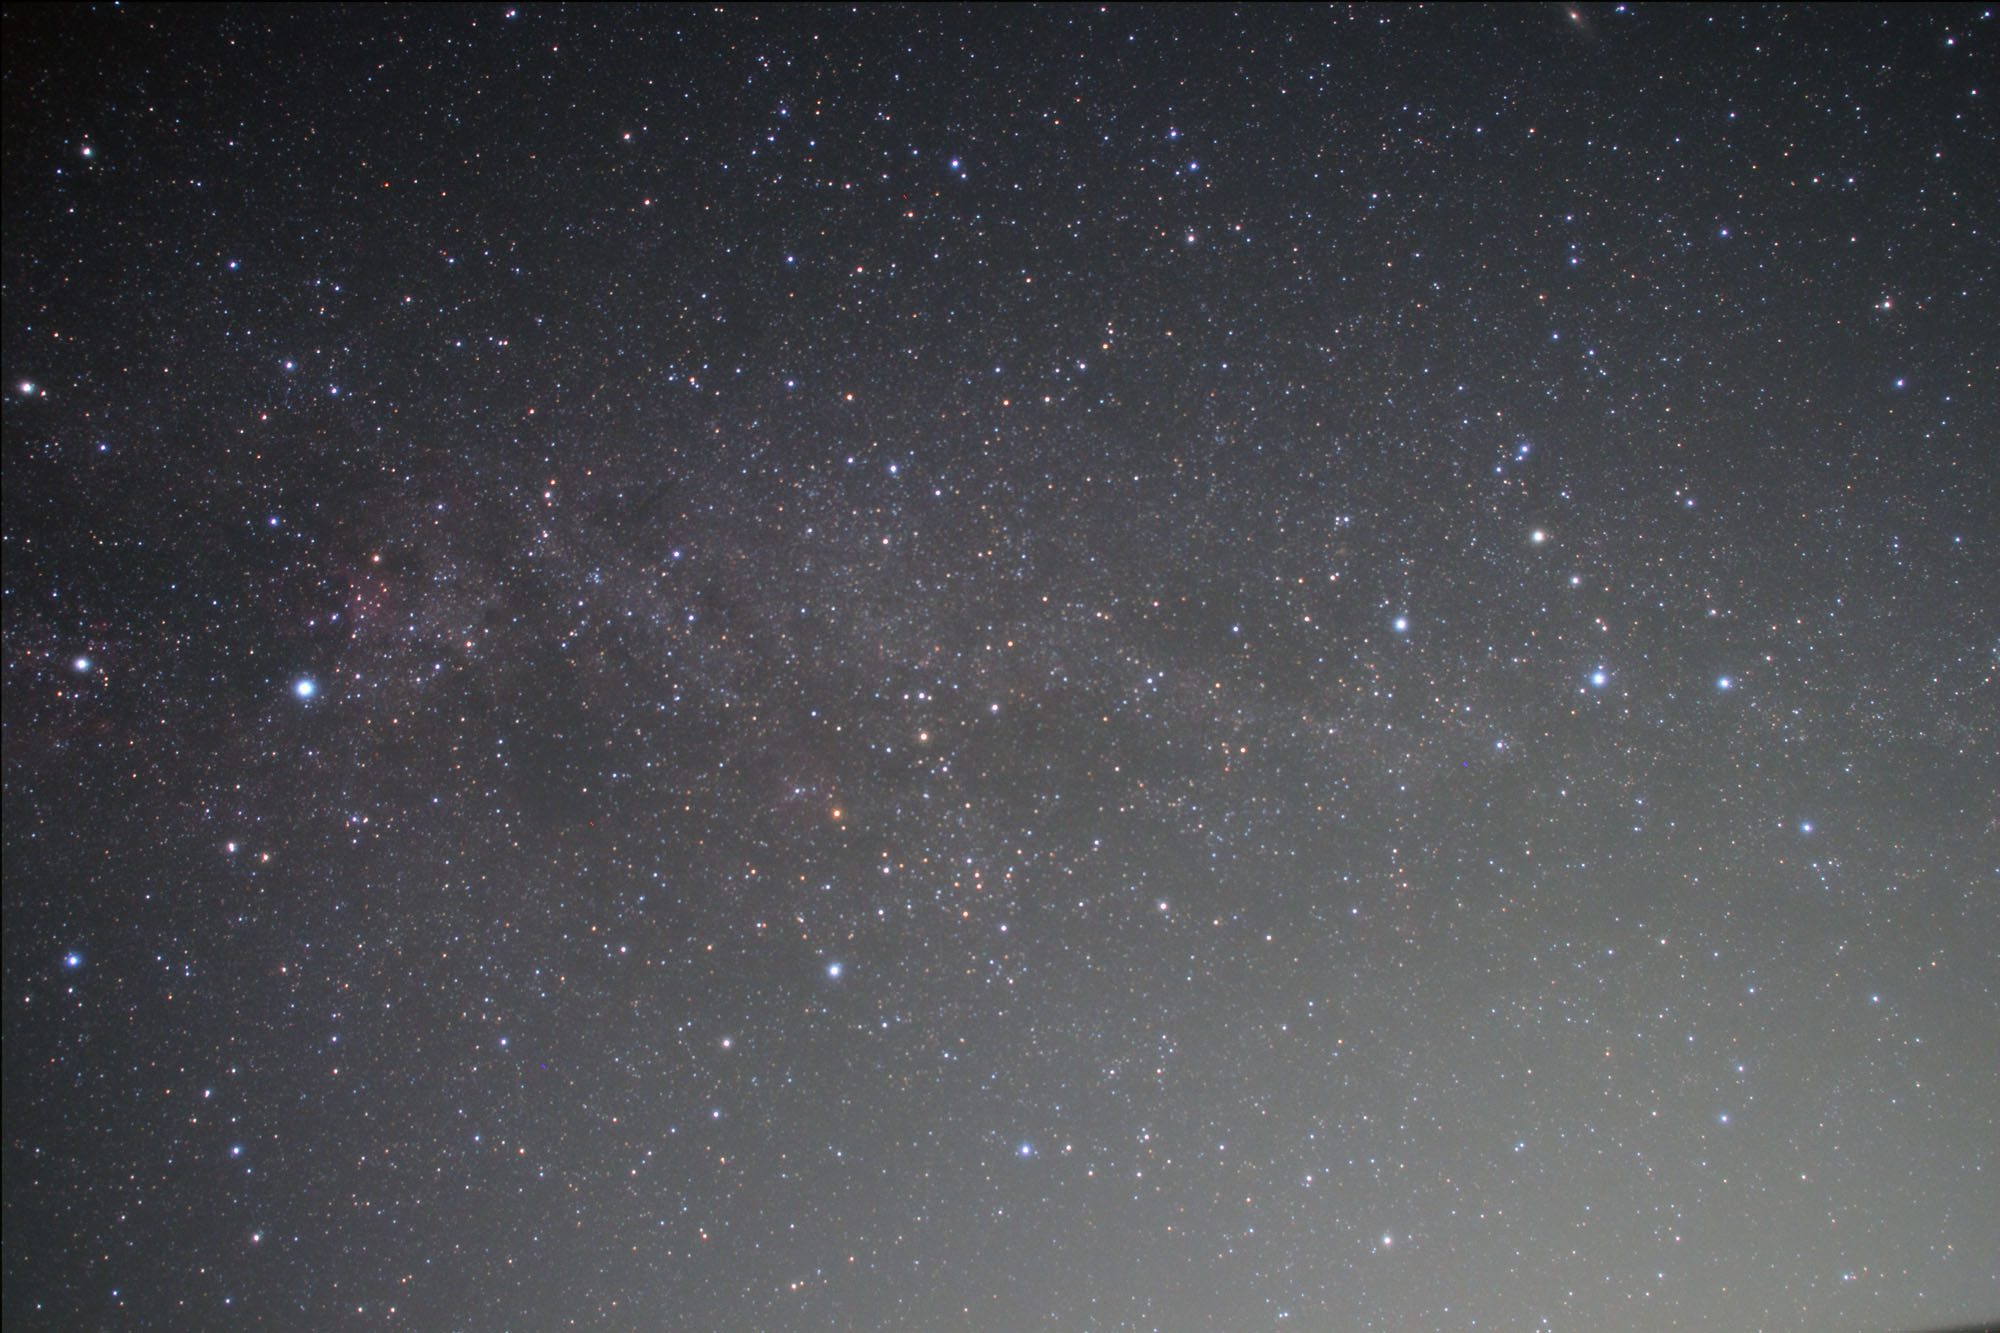 8月14日の星野写真_e0174091_16133677.jpg